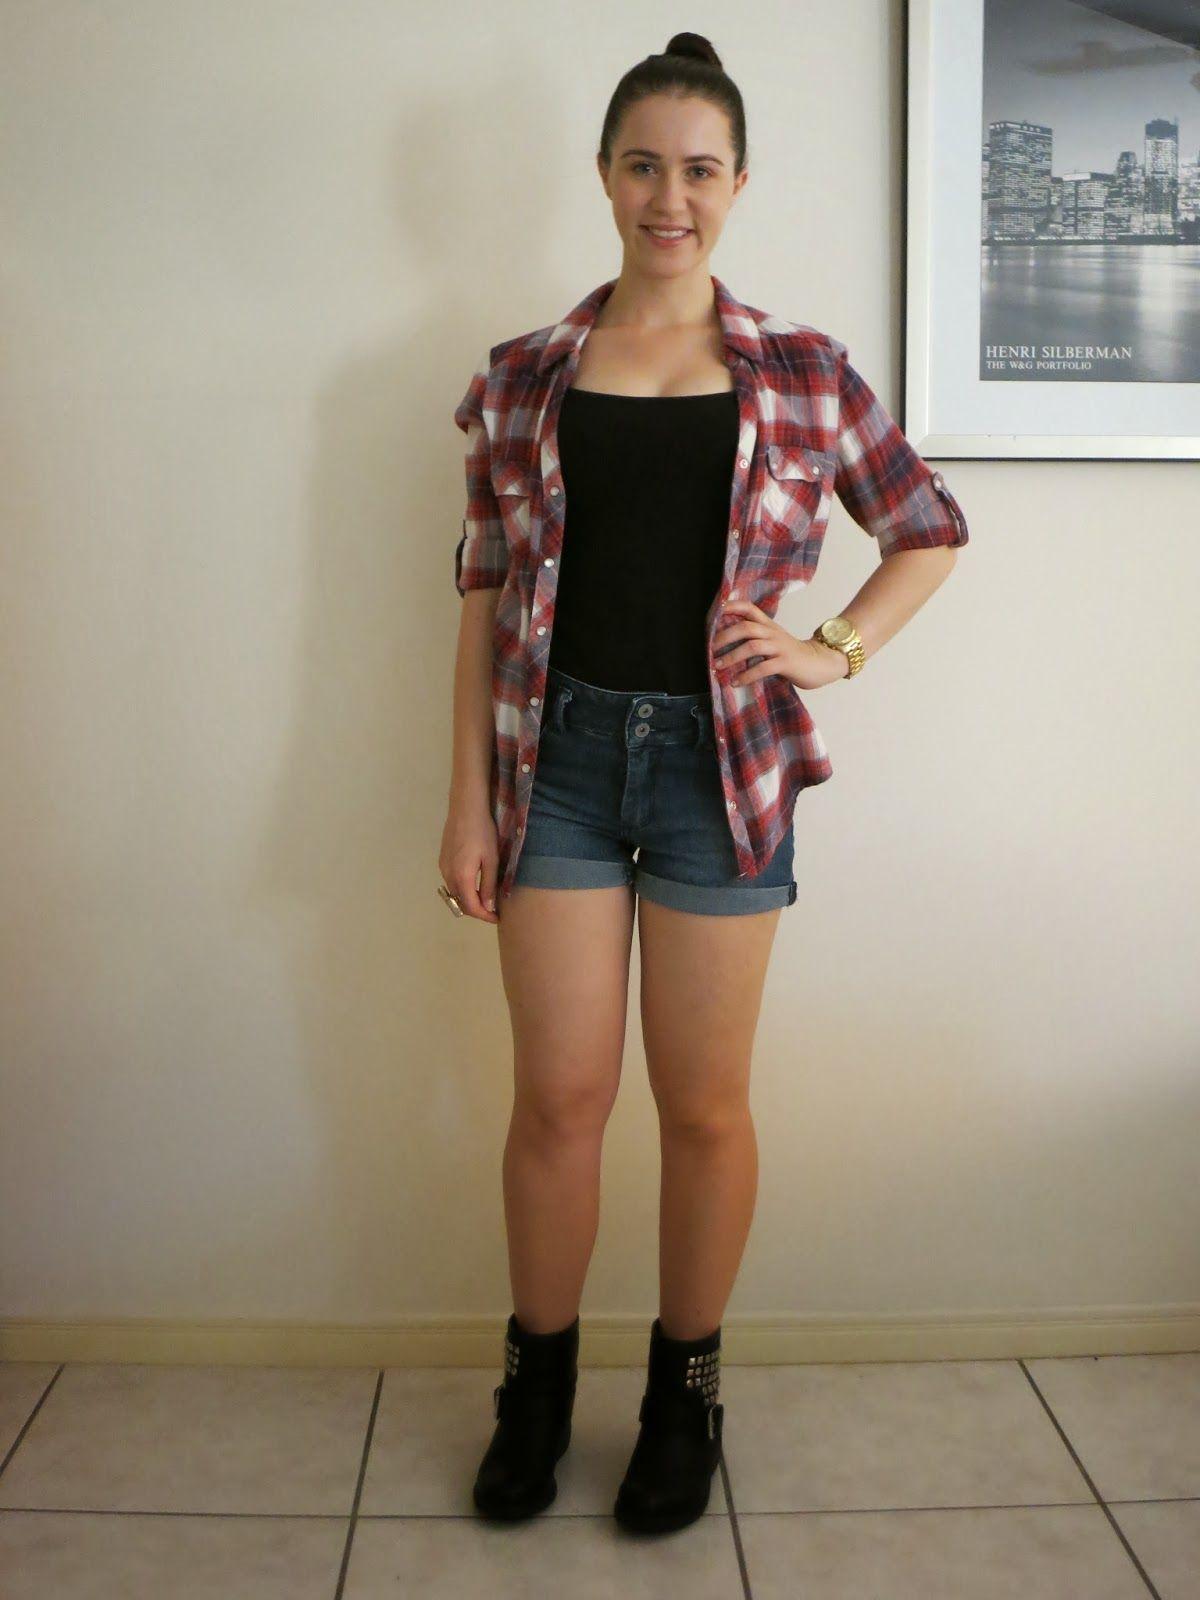 Flannel shirt with shorts  Plaid Denim u Biker Boots  My Pretty Little Liars  Pinterest